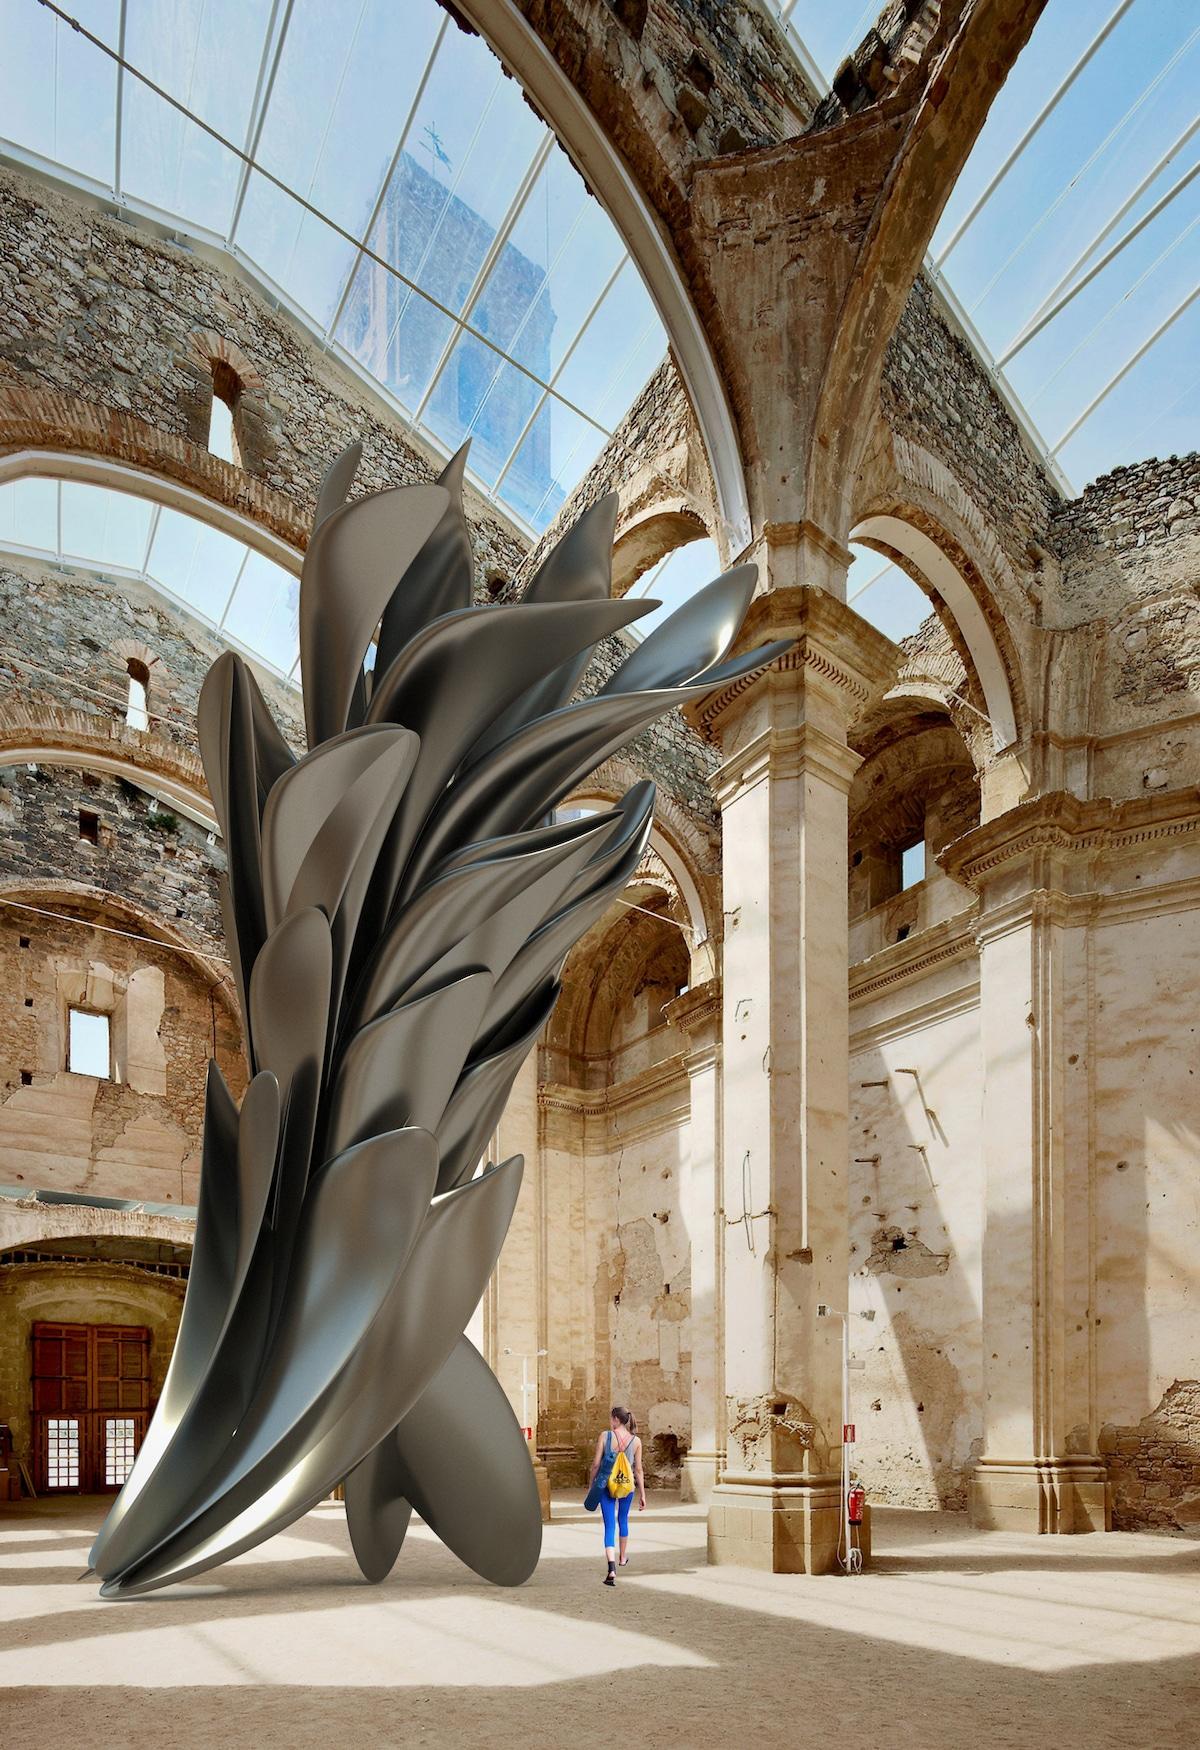 Ken Kelleher's Virtual Sculptures Show the Power of Public Art